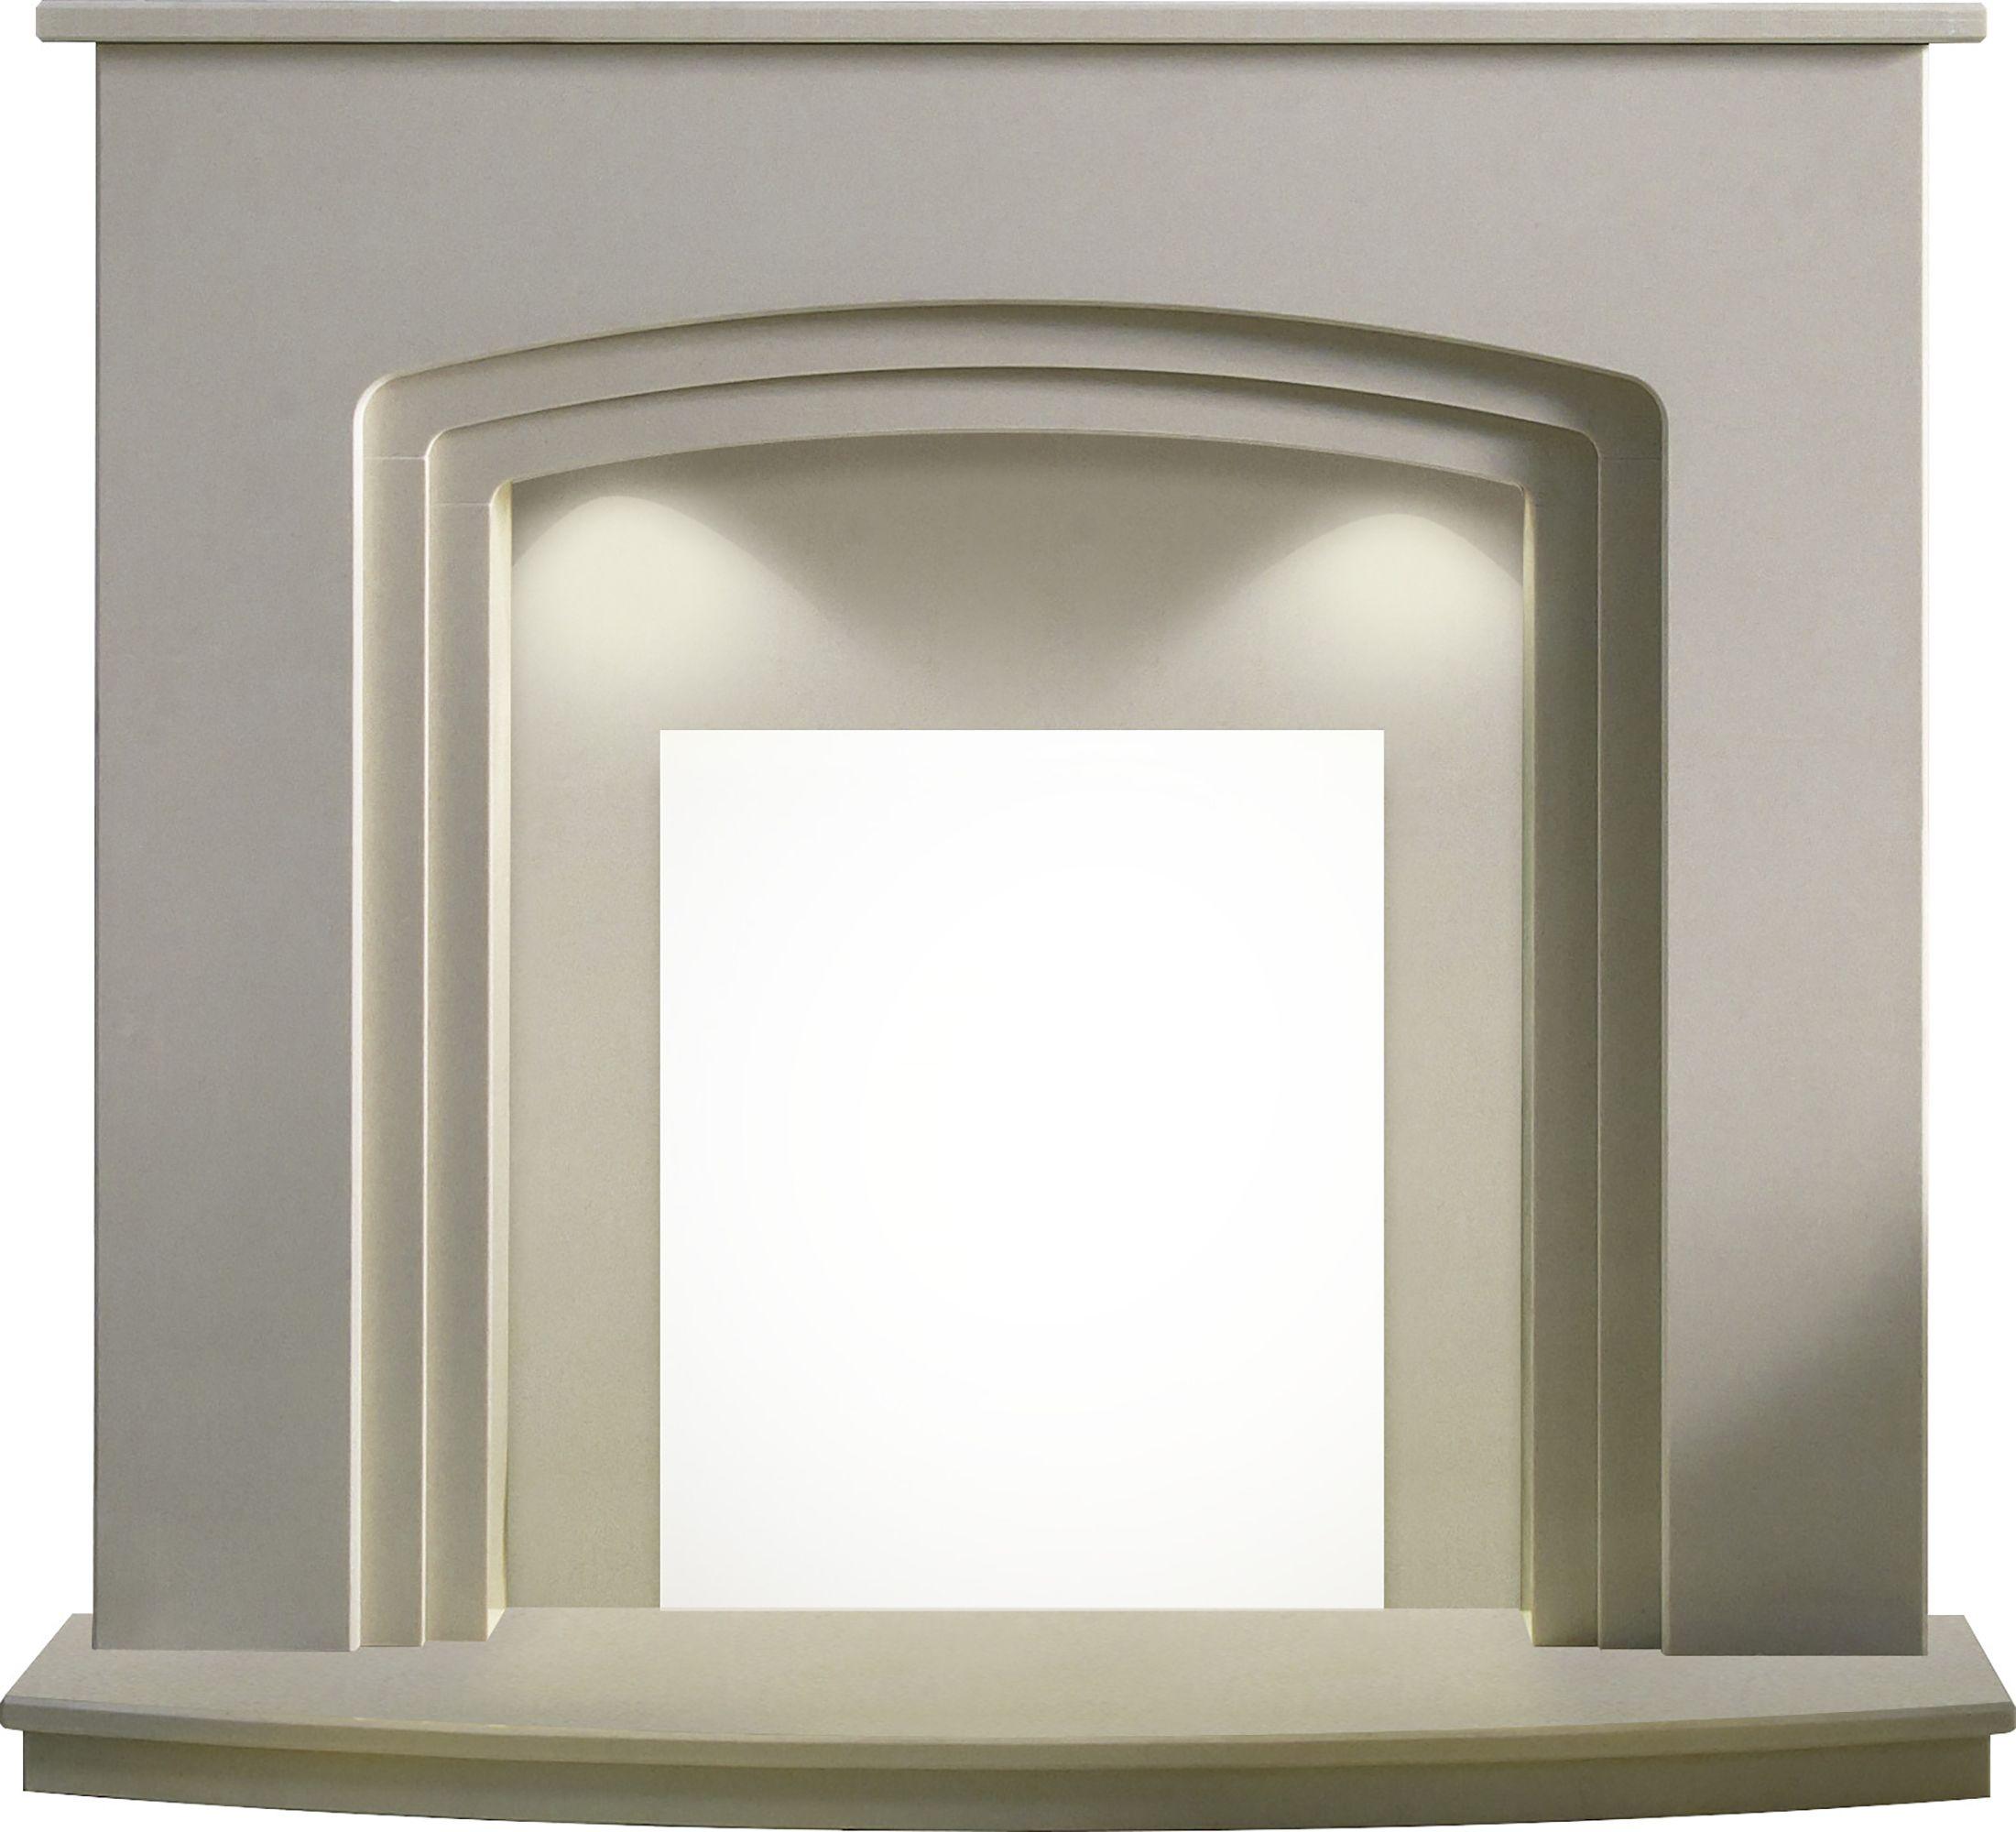 Stone Effect Fireplace Surrounds Part - 35: Bu0026Q